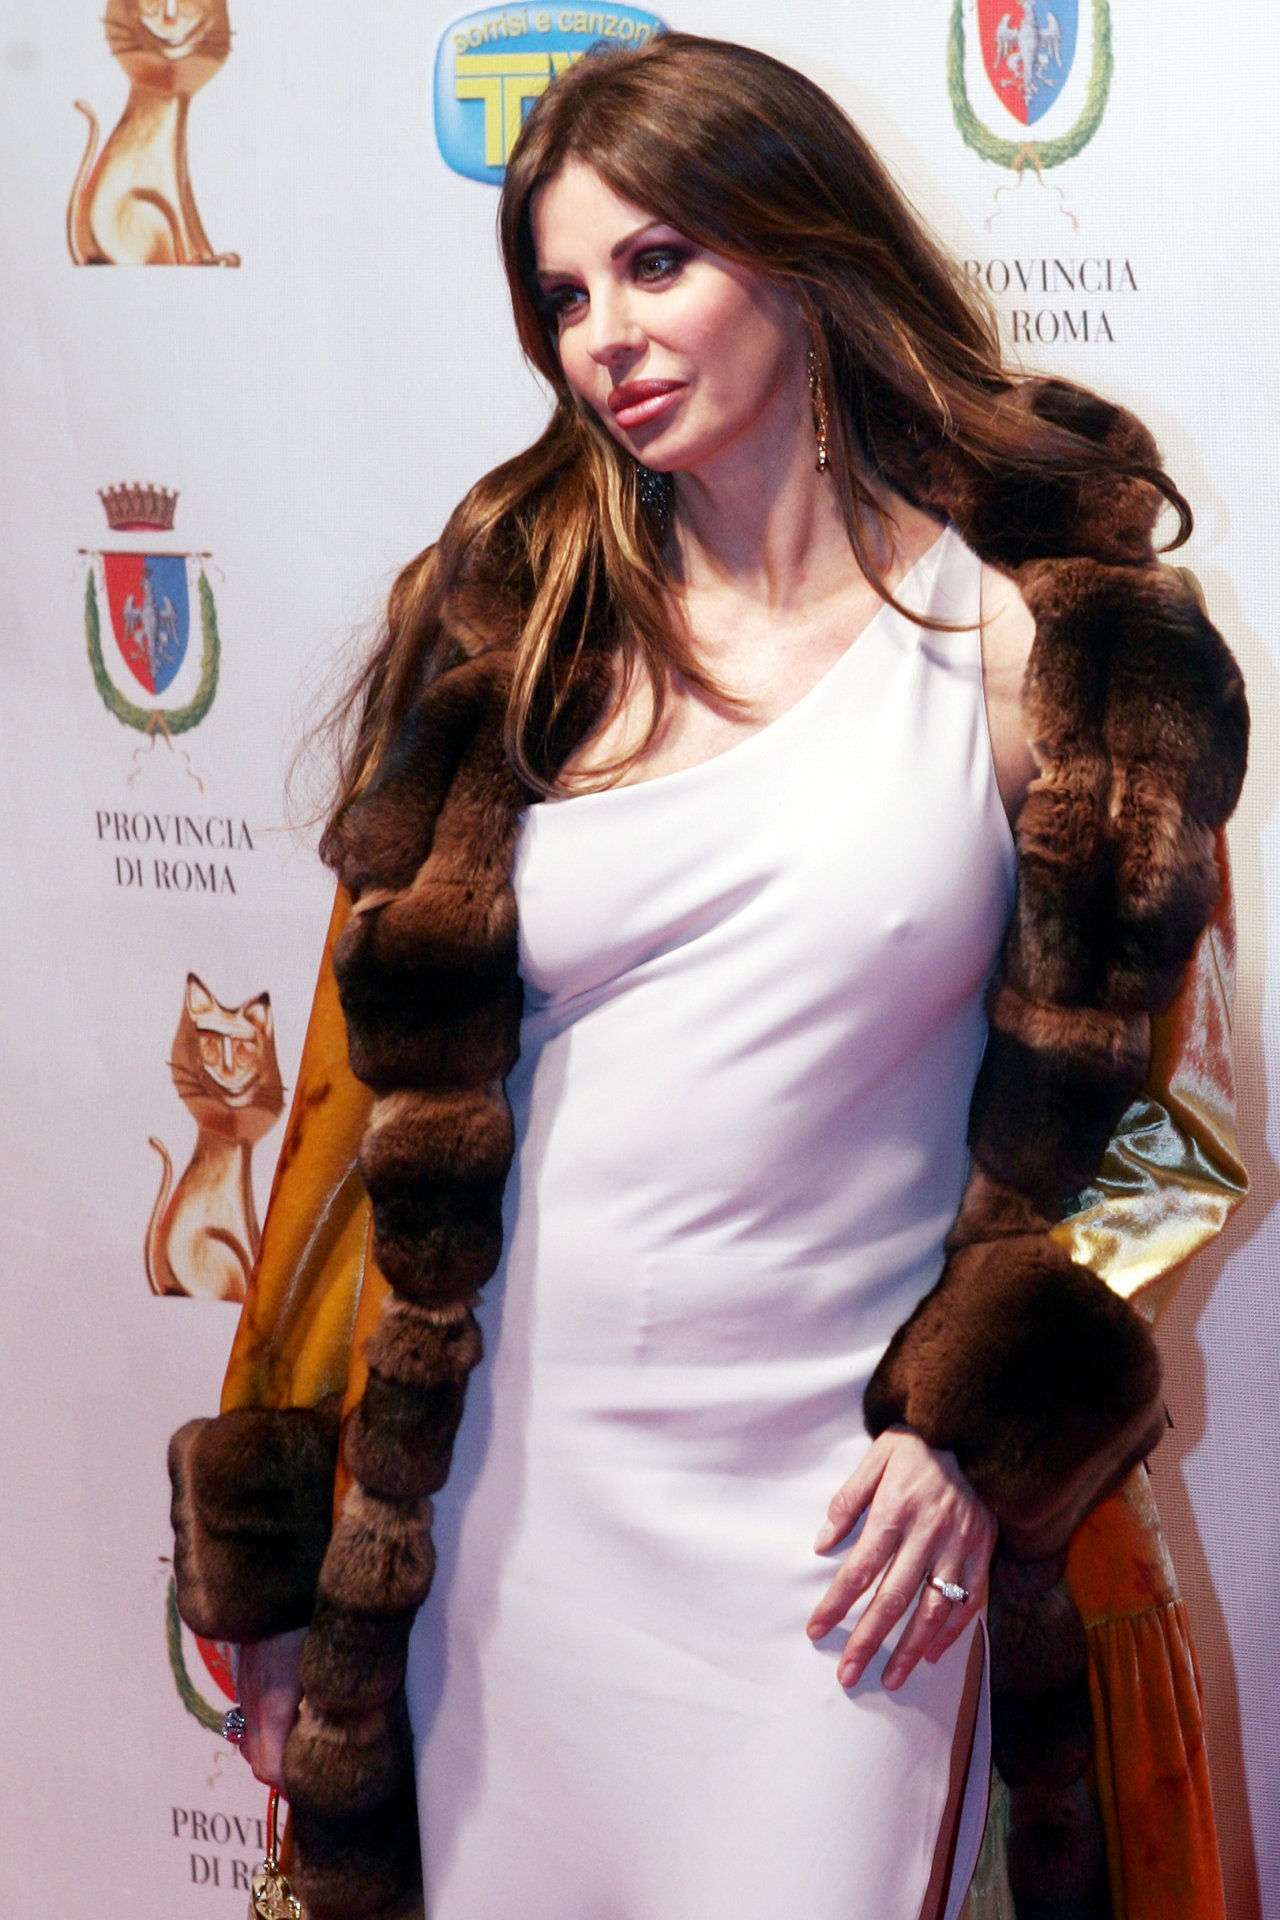 Alba Parietti wallpape... Amy Adams